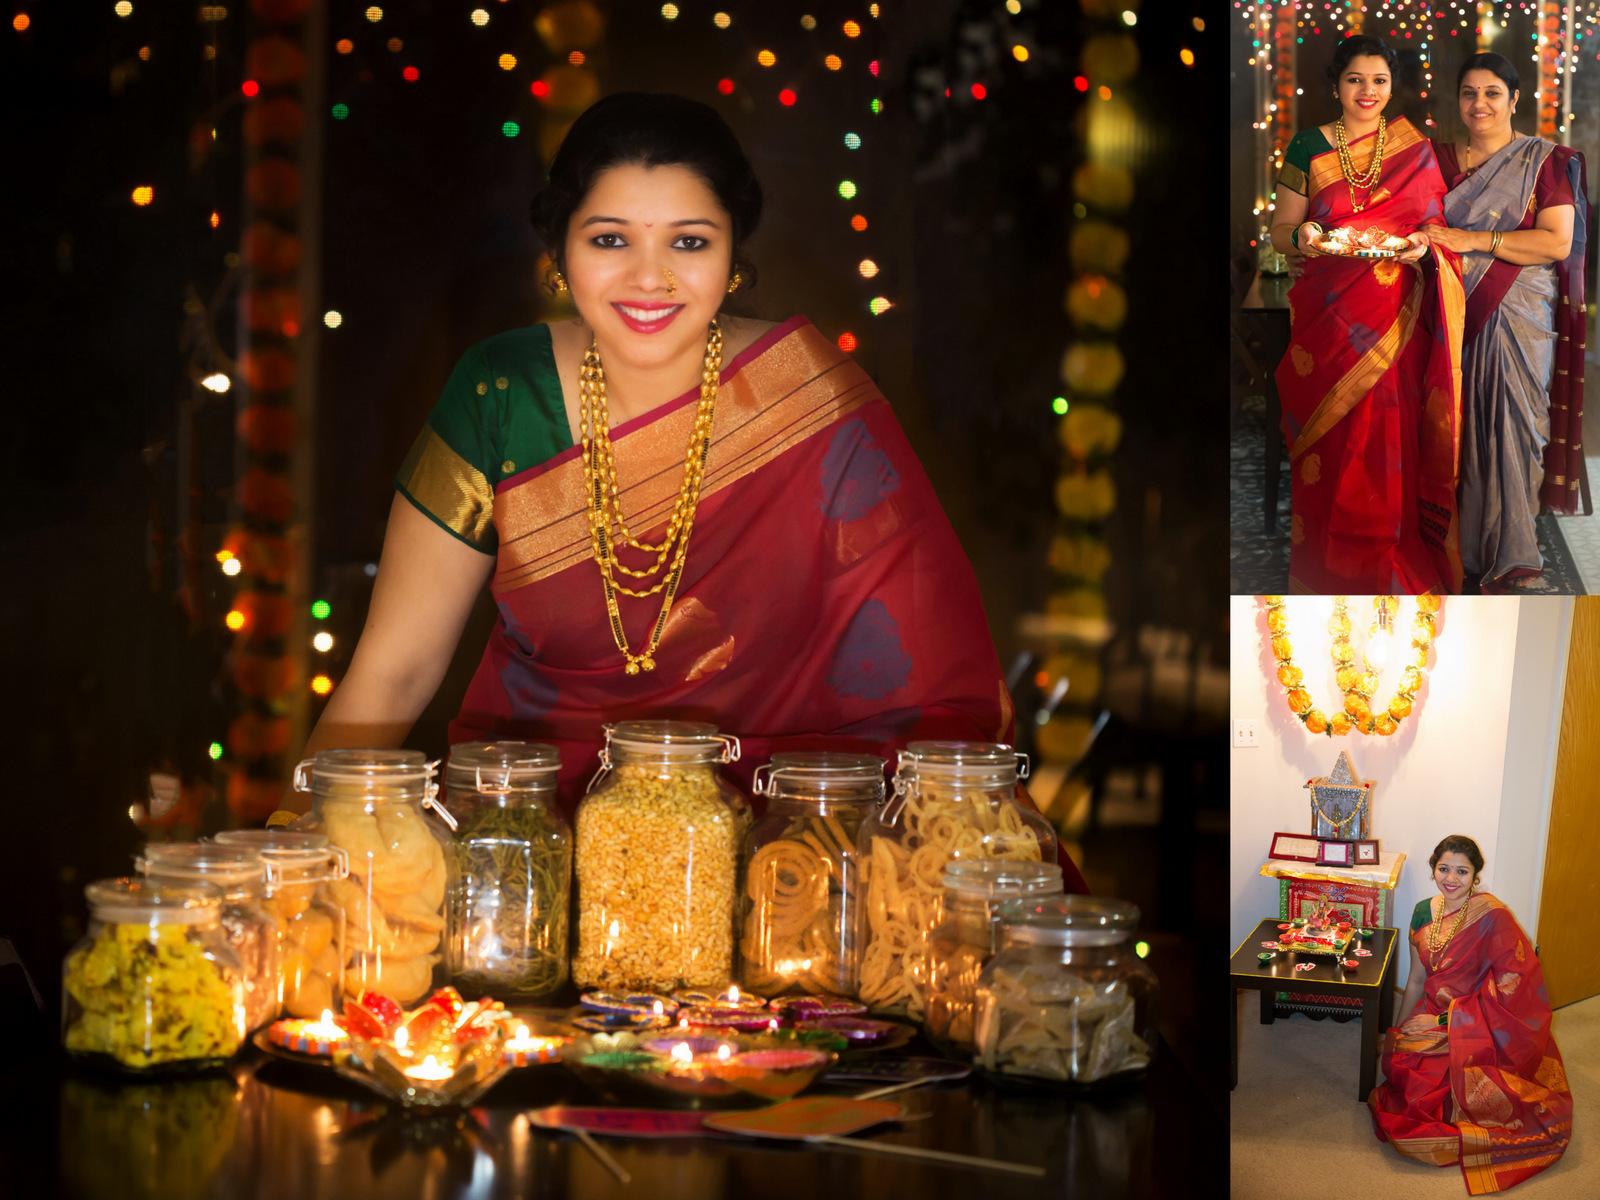 laxmipujan, sev recipe, kalakand recipe, diwali2017, diwalirecipes, diwali celebrations, saree, indian festivals